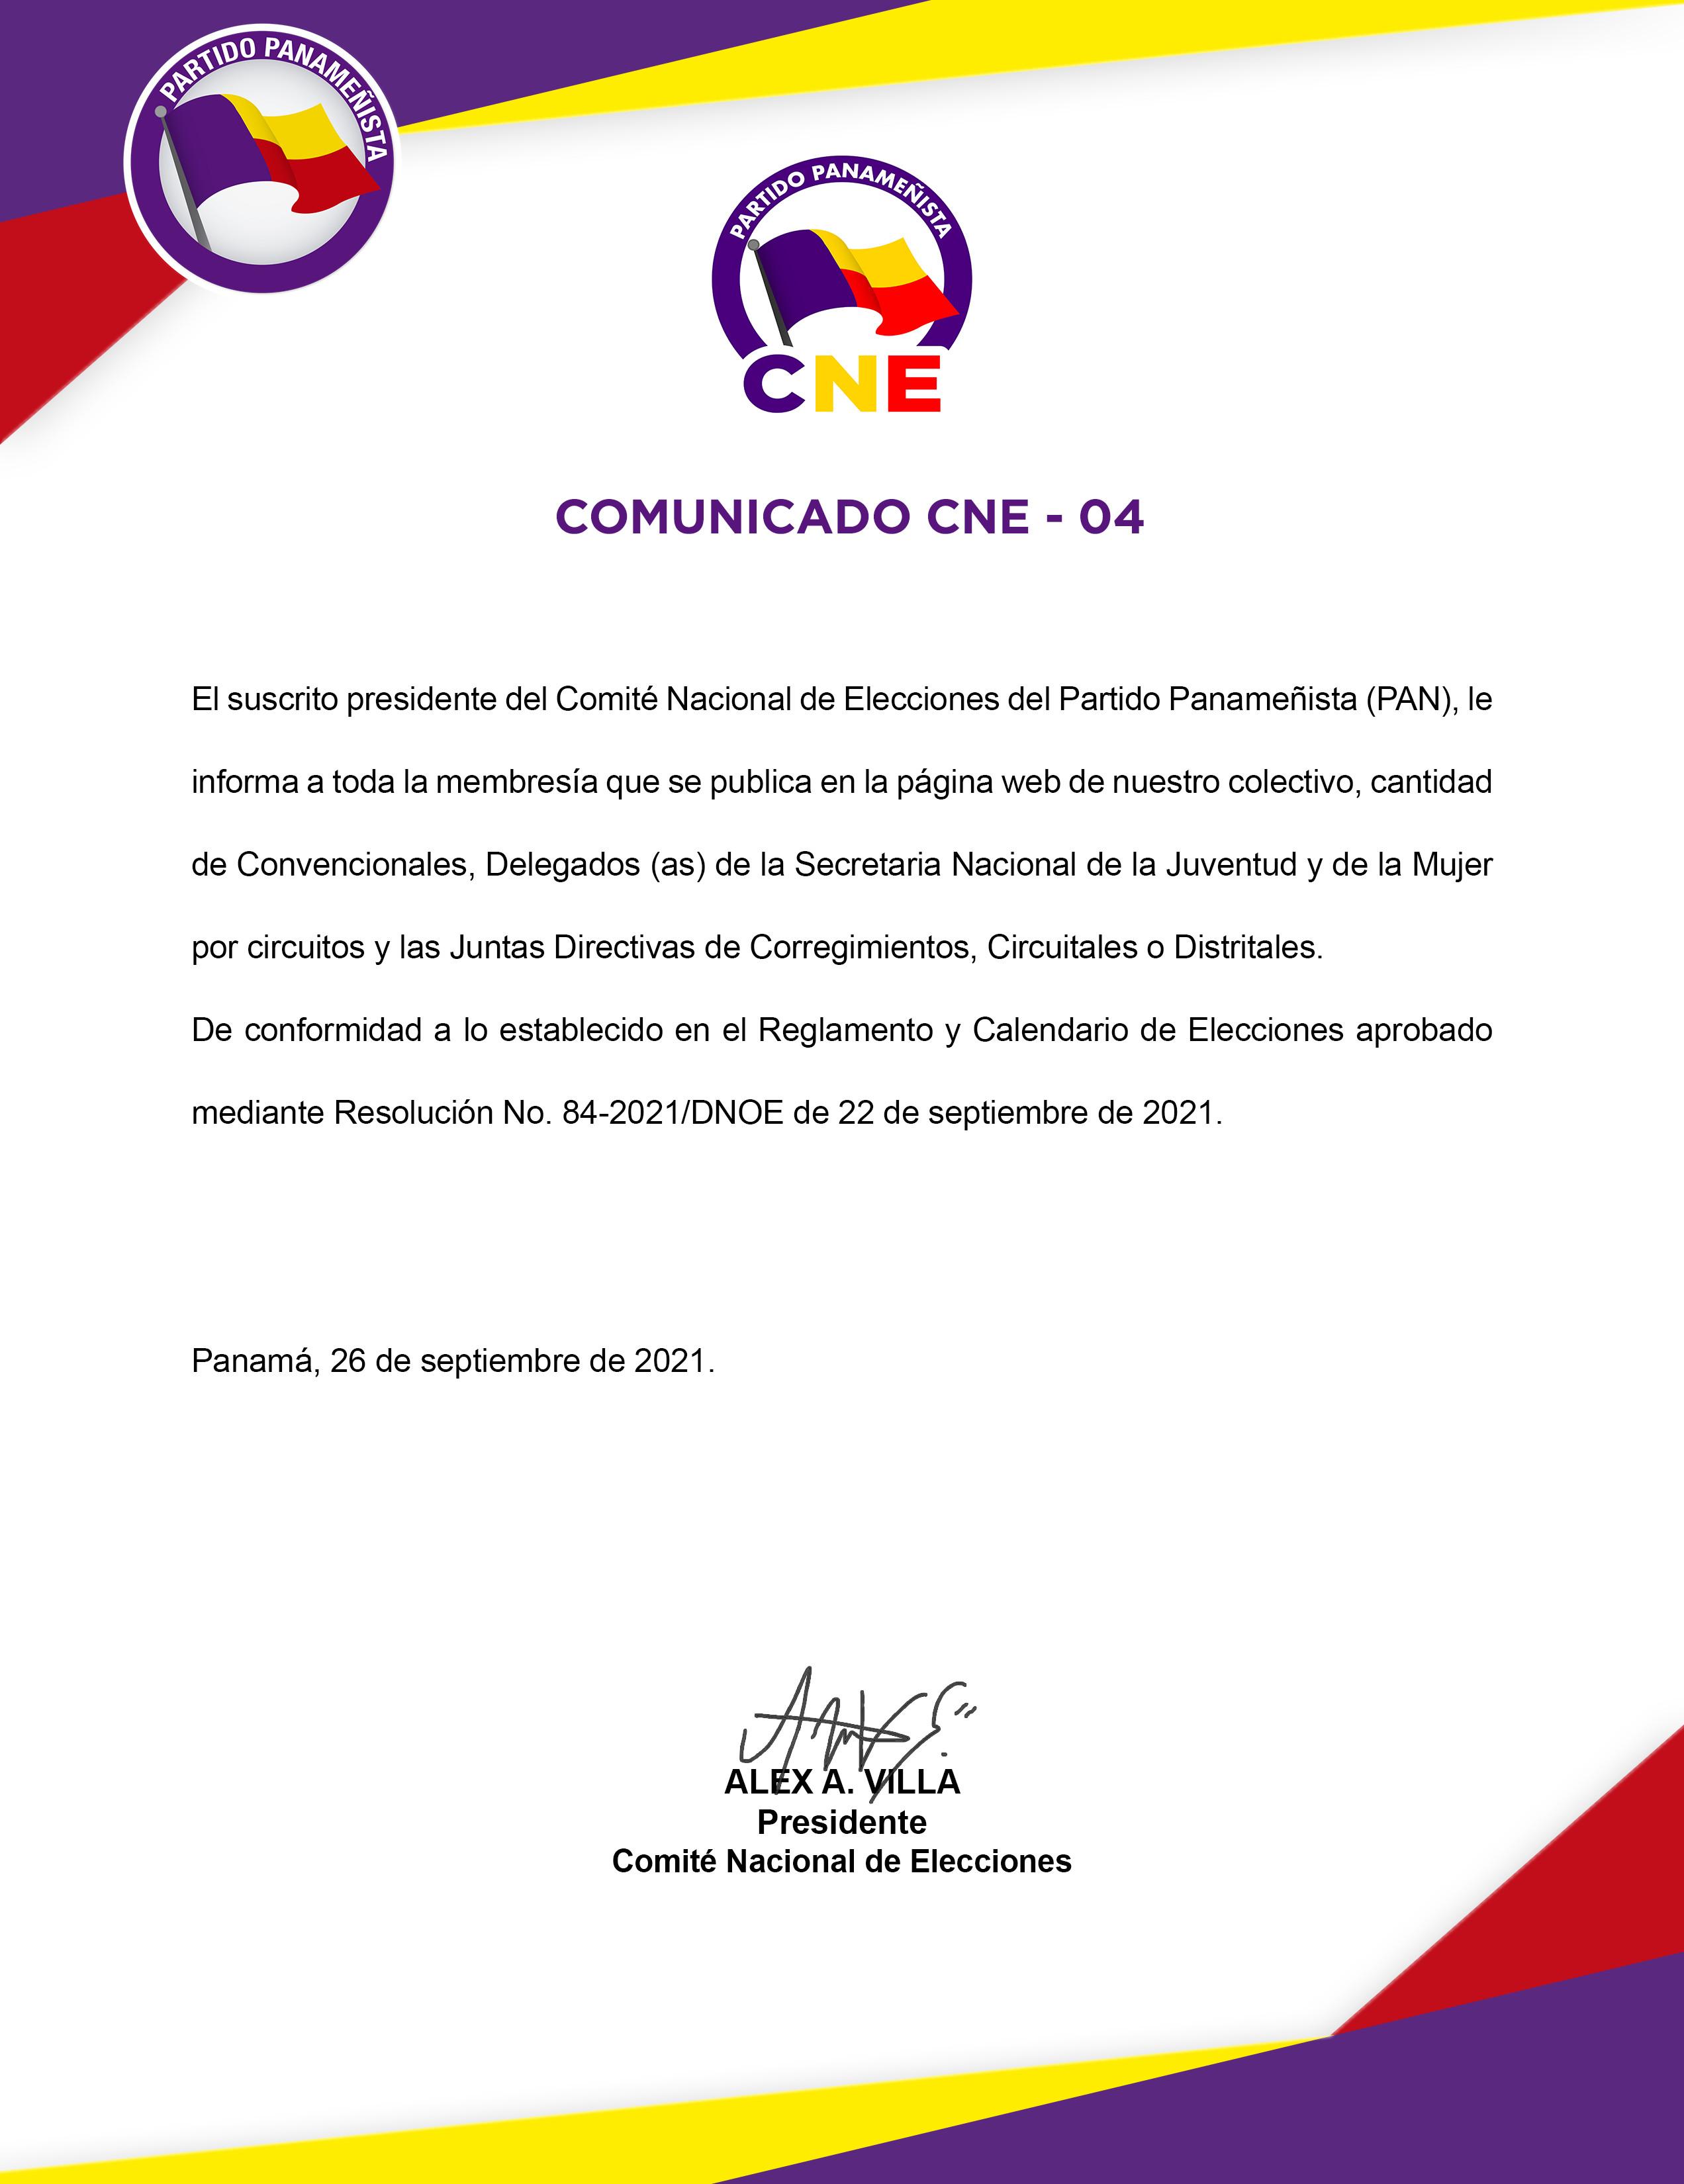 COMUNICACIONES_CNE-2021-2(1).jpg